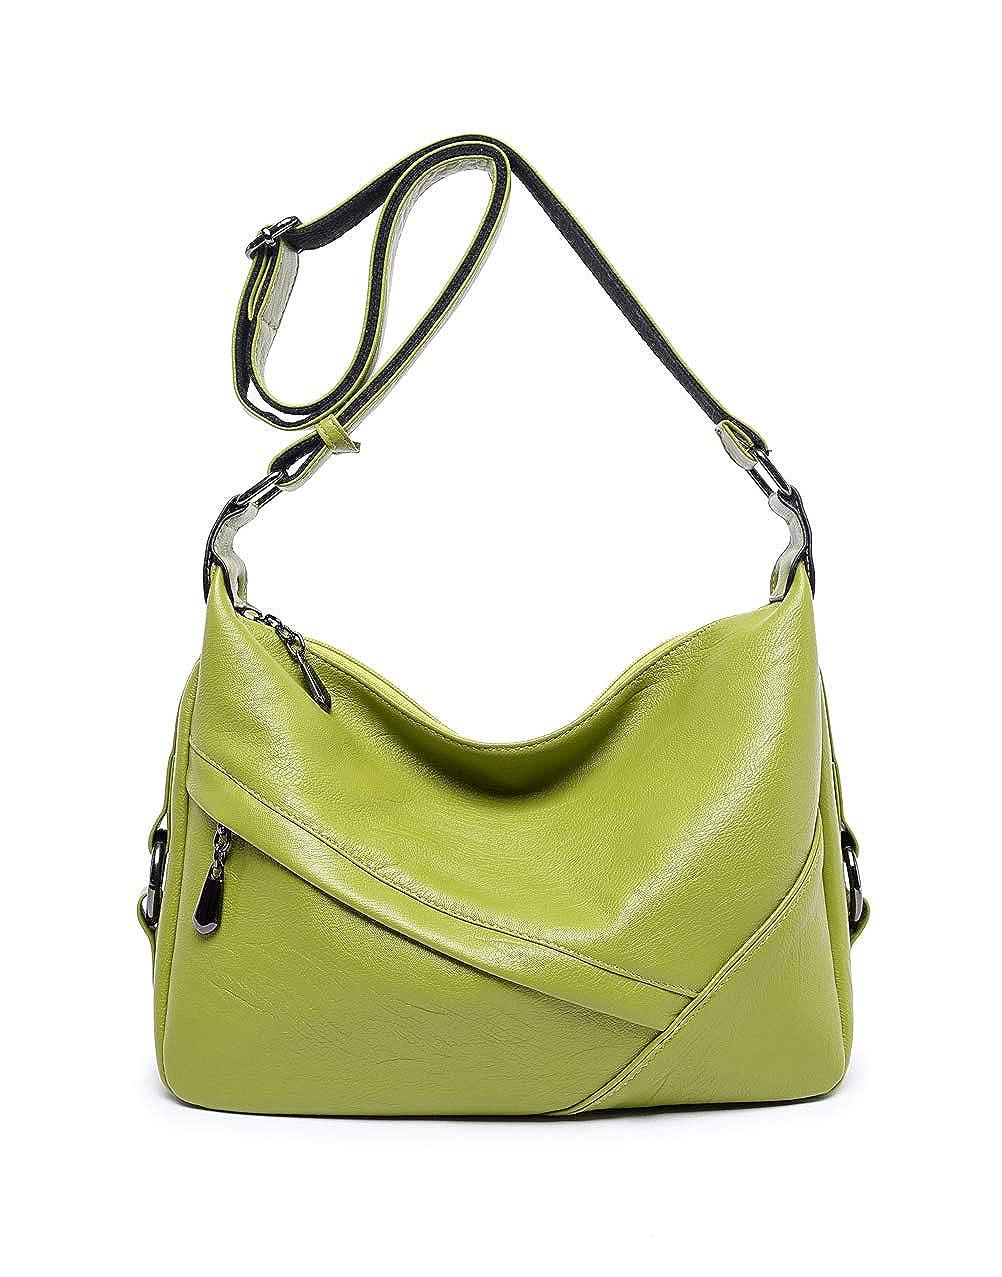 Women/'s Retro Sling Shoulder Bag from Covelin Leather Crossbody Tote Handbag New